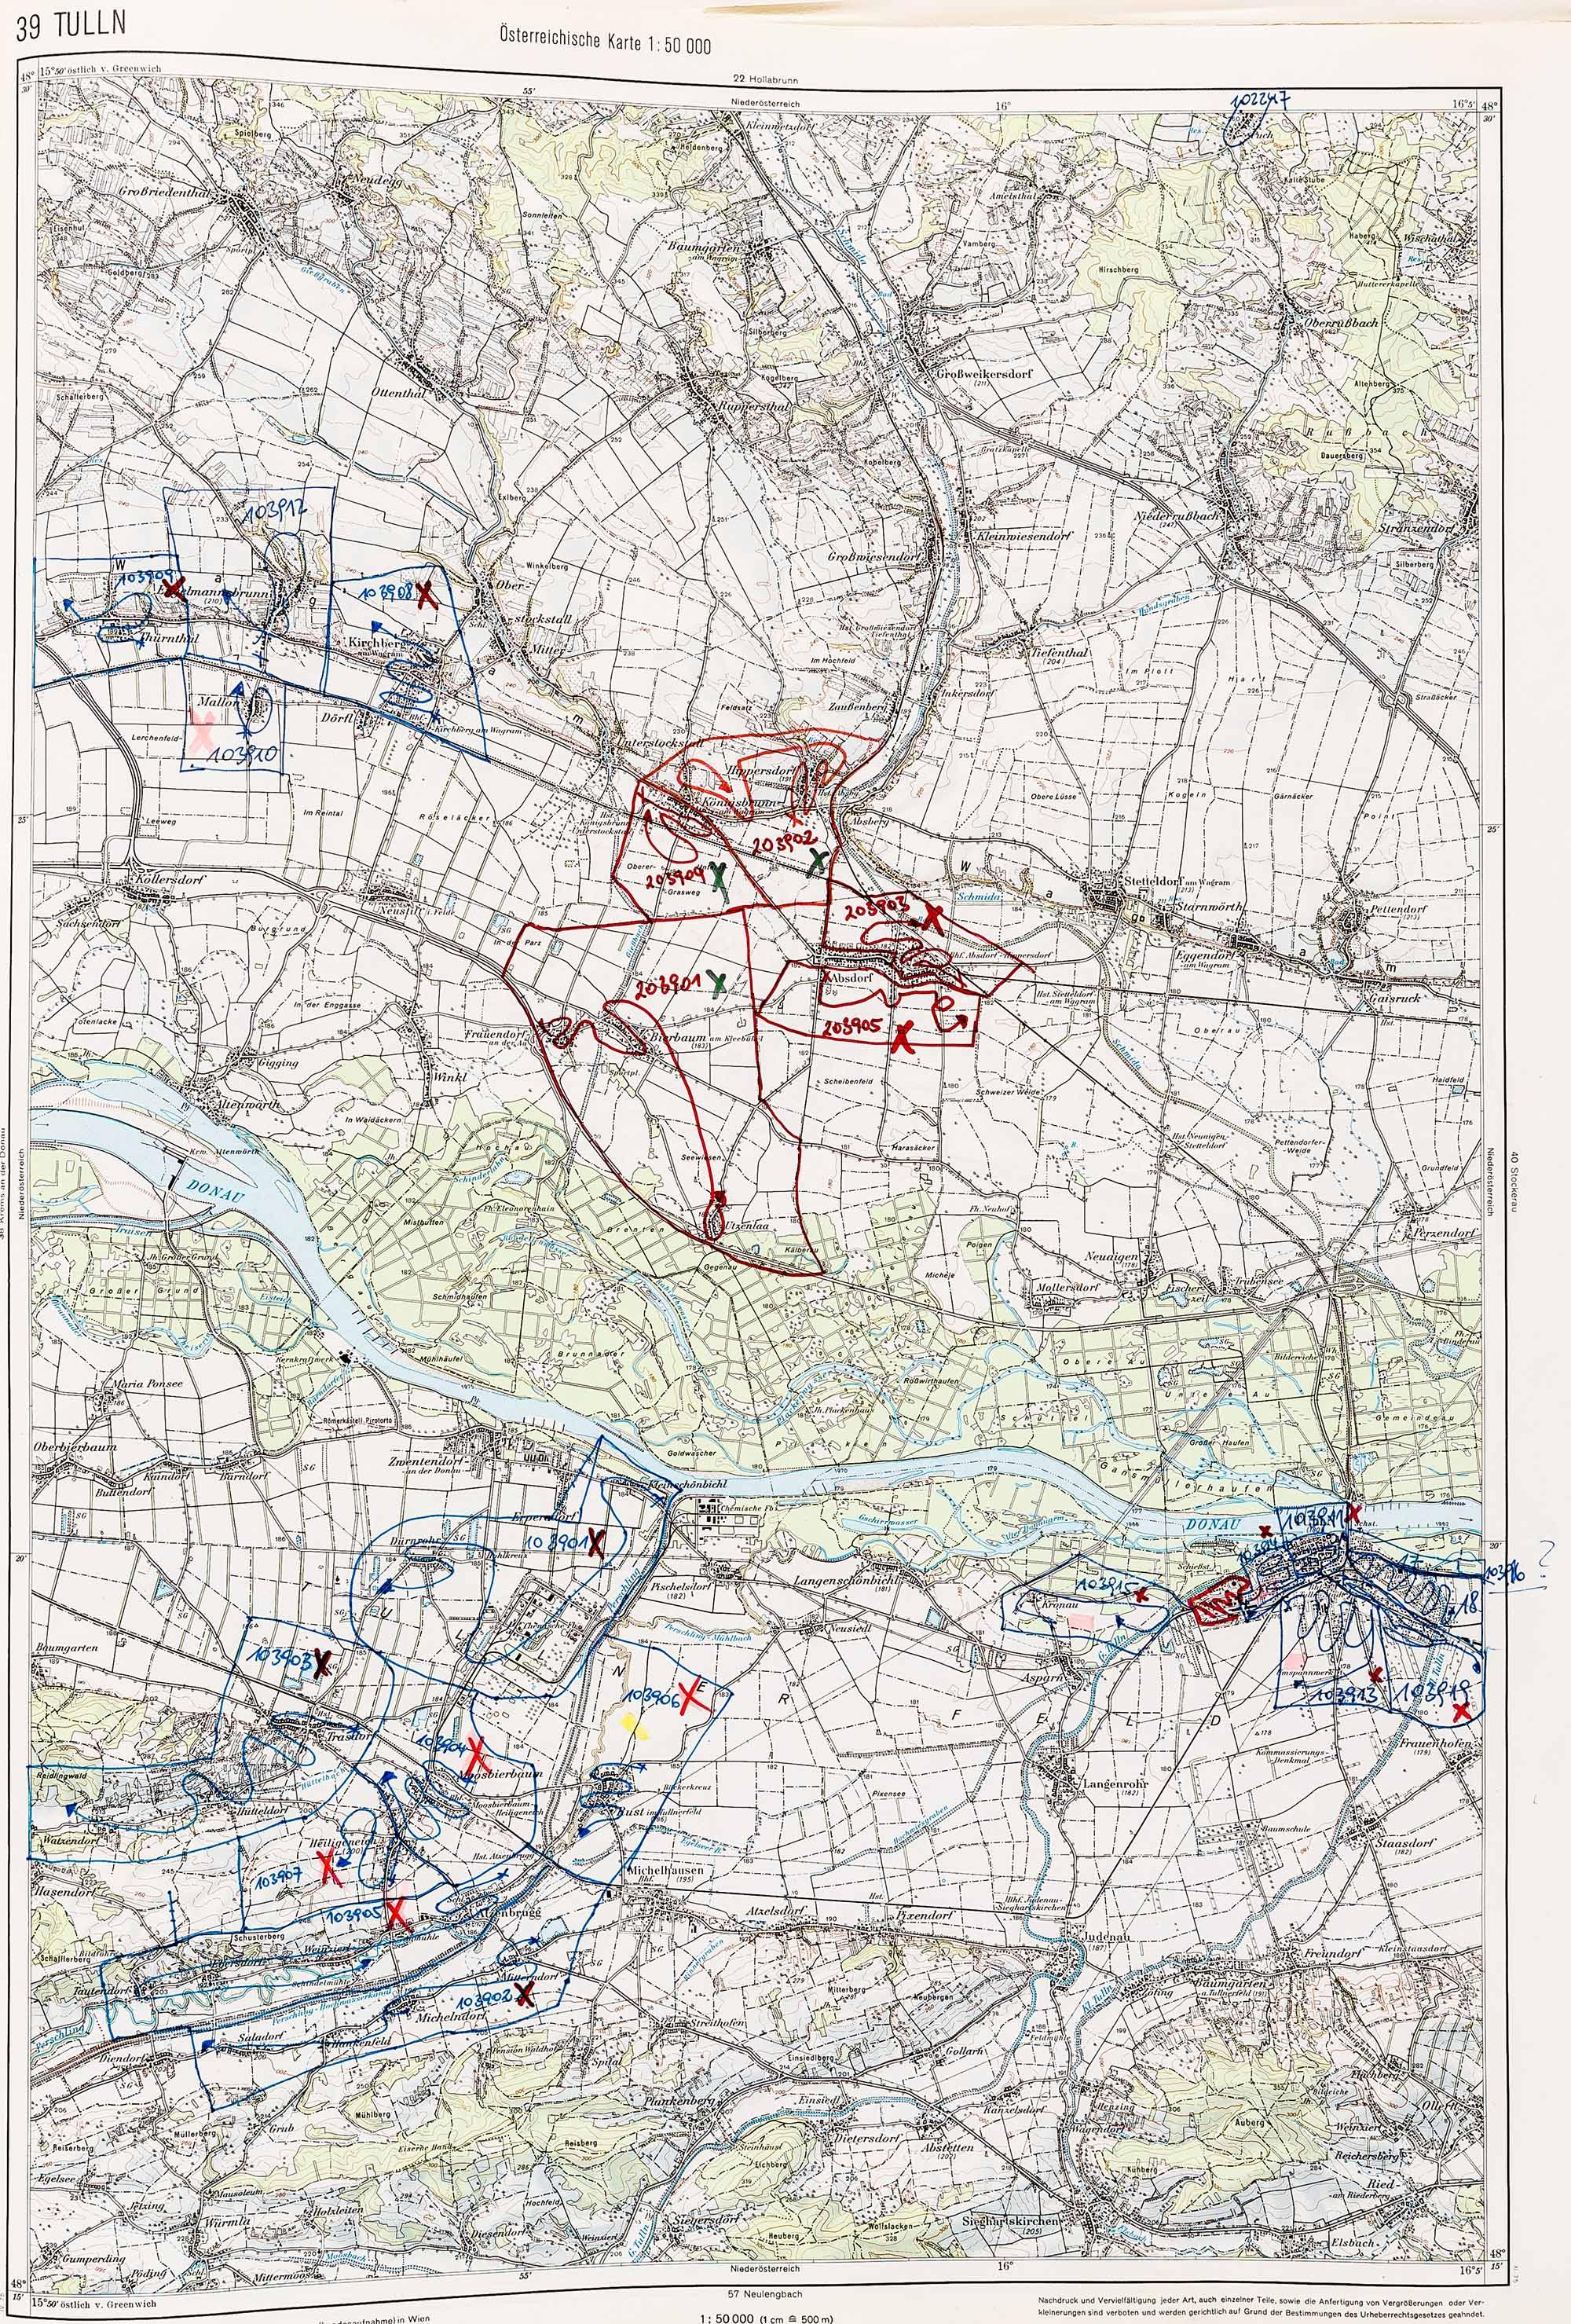 1979-1982 Karte 039